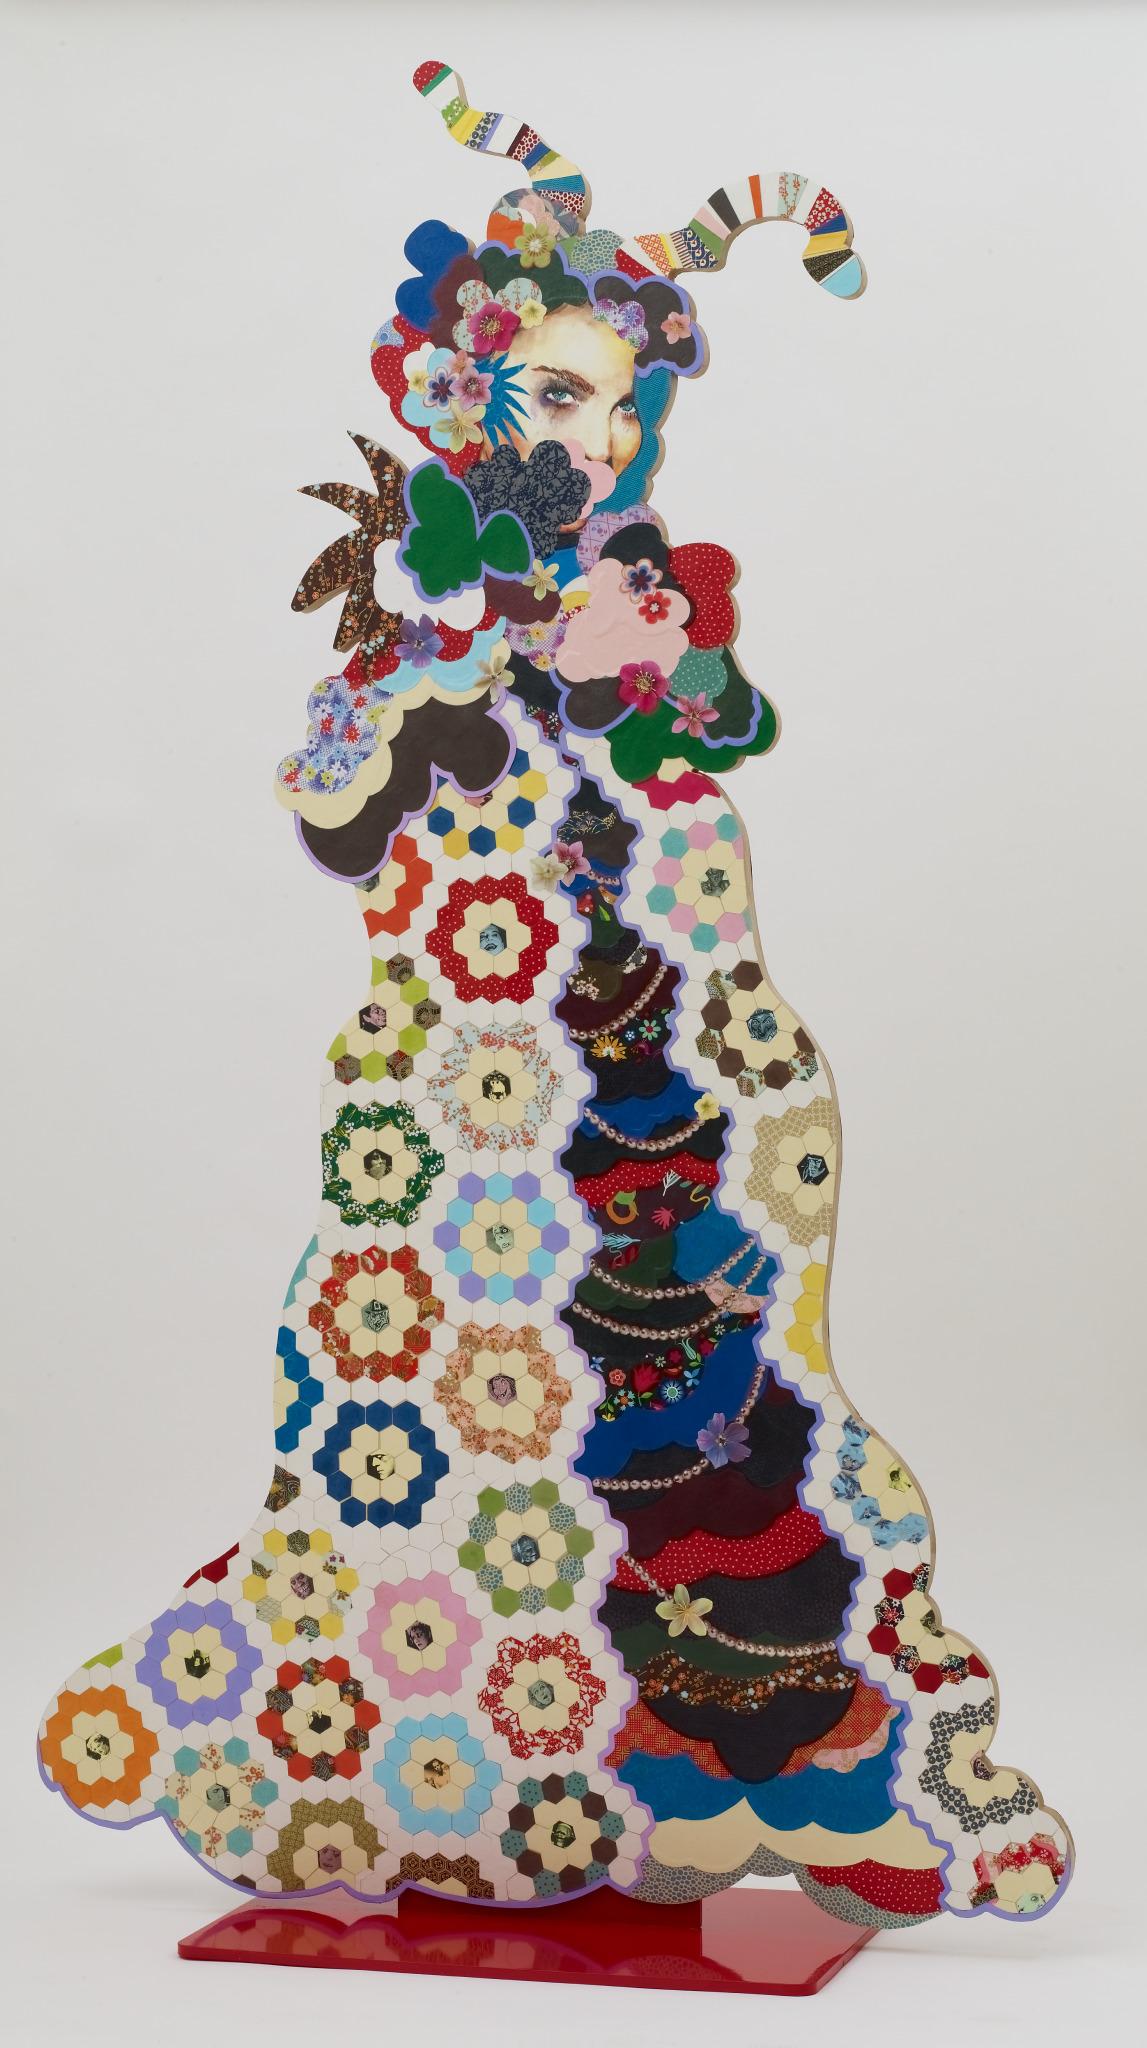 Art Hopping Through Ft Worth s Gallery Night – Tanglewood Moms